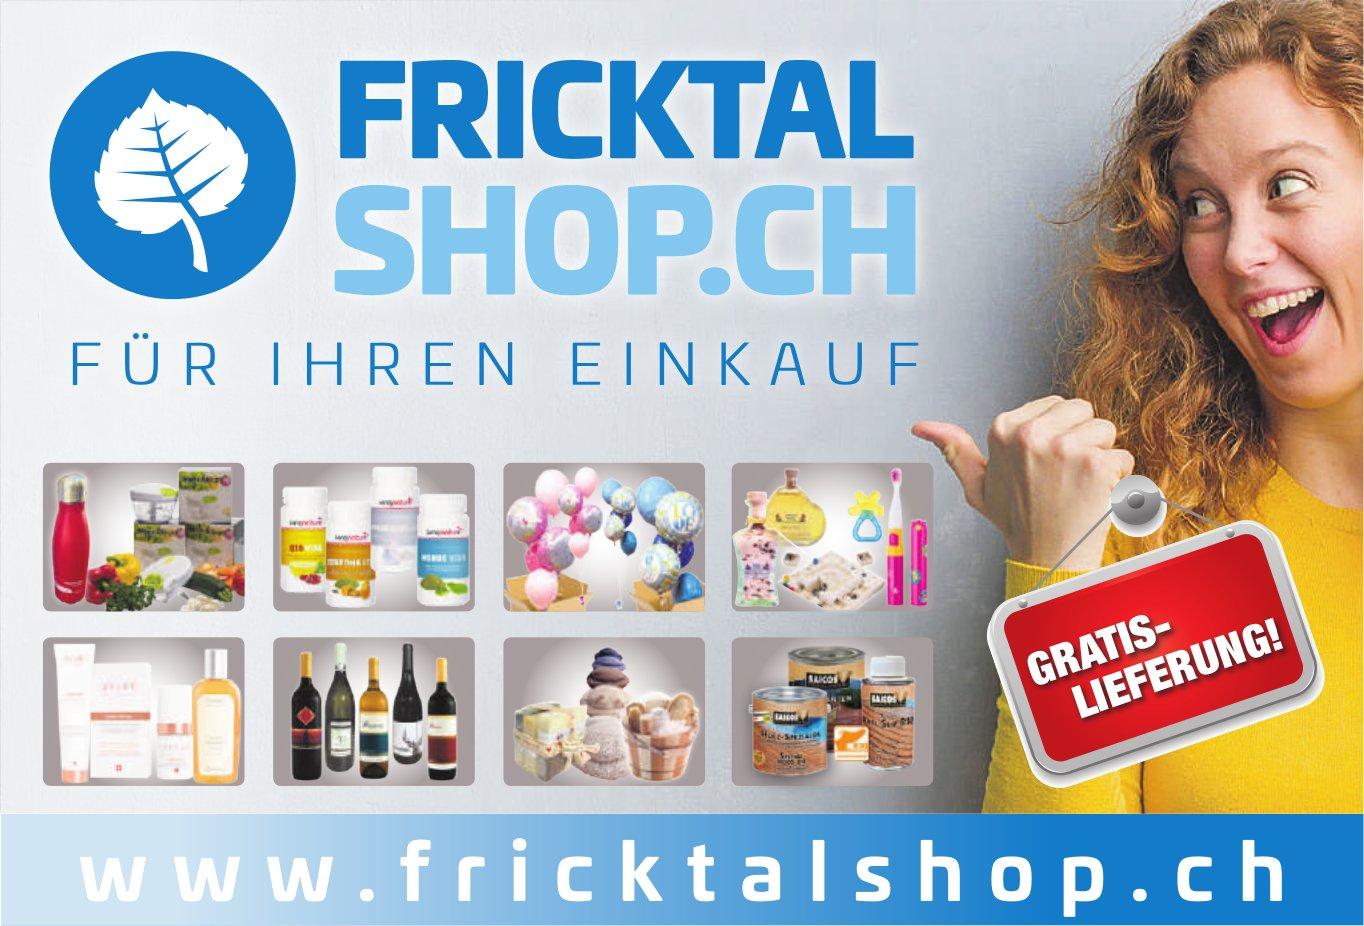 Fricktal Shop.ch - Gratis-Lieferung!